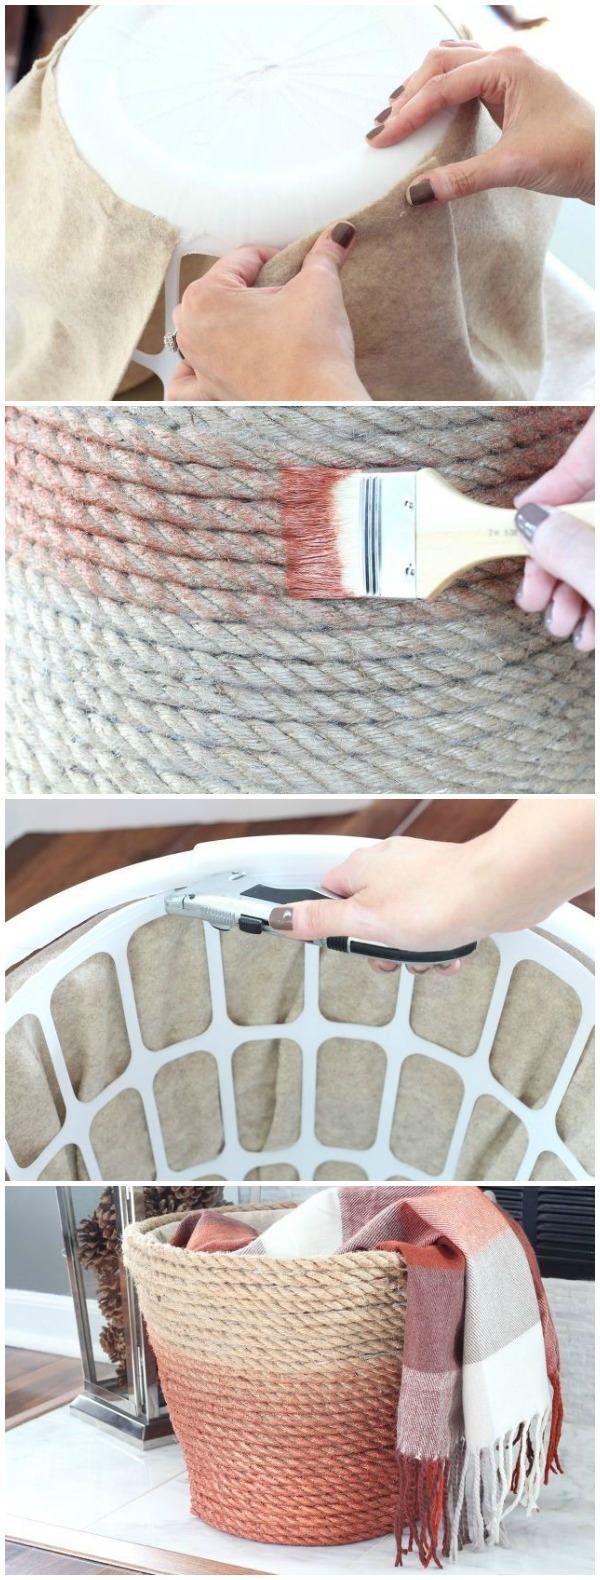 Dollar Store Laundry Basket Turned Chic Metallic Rope Basket